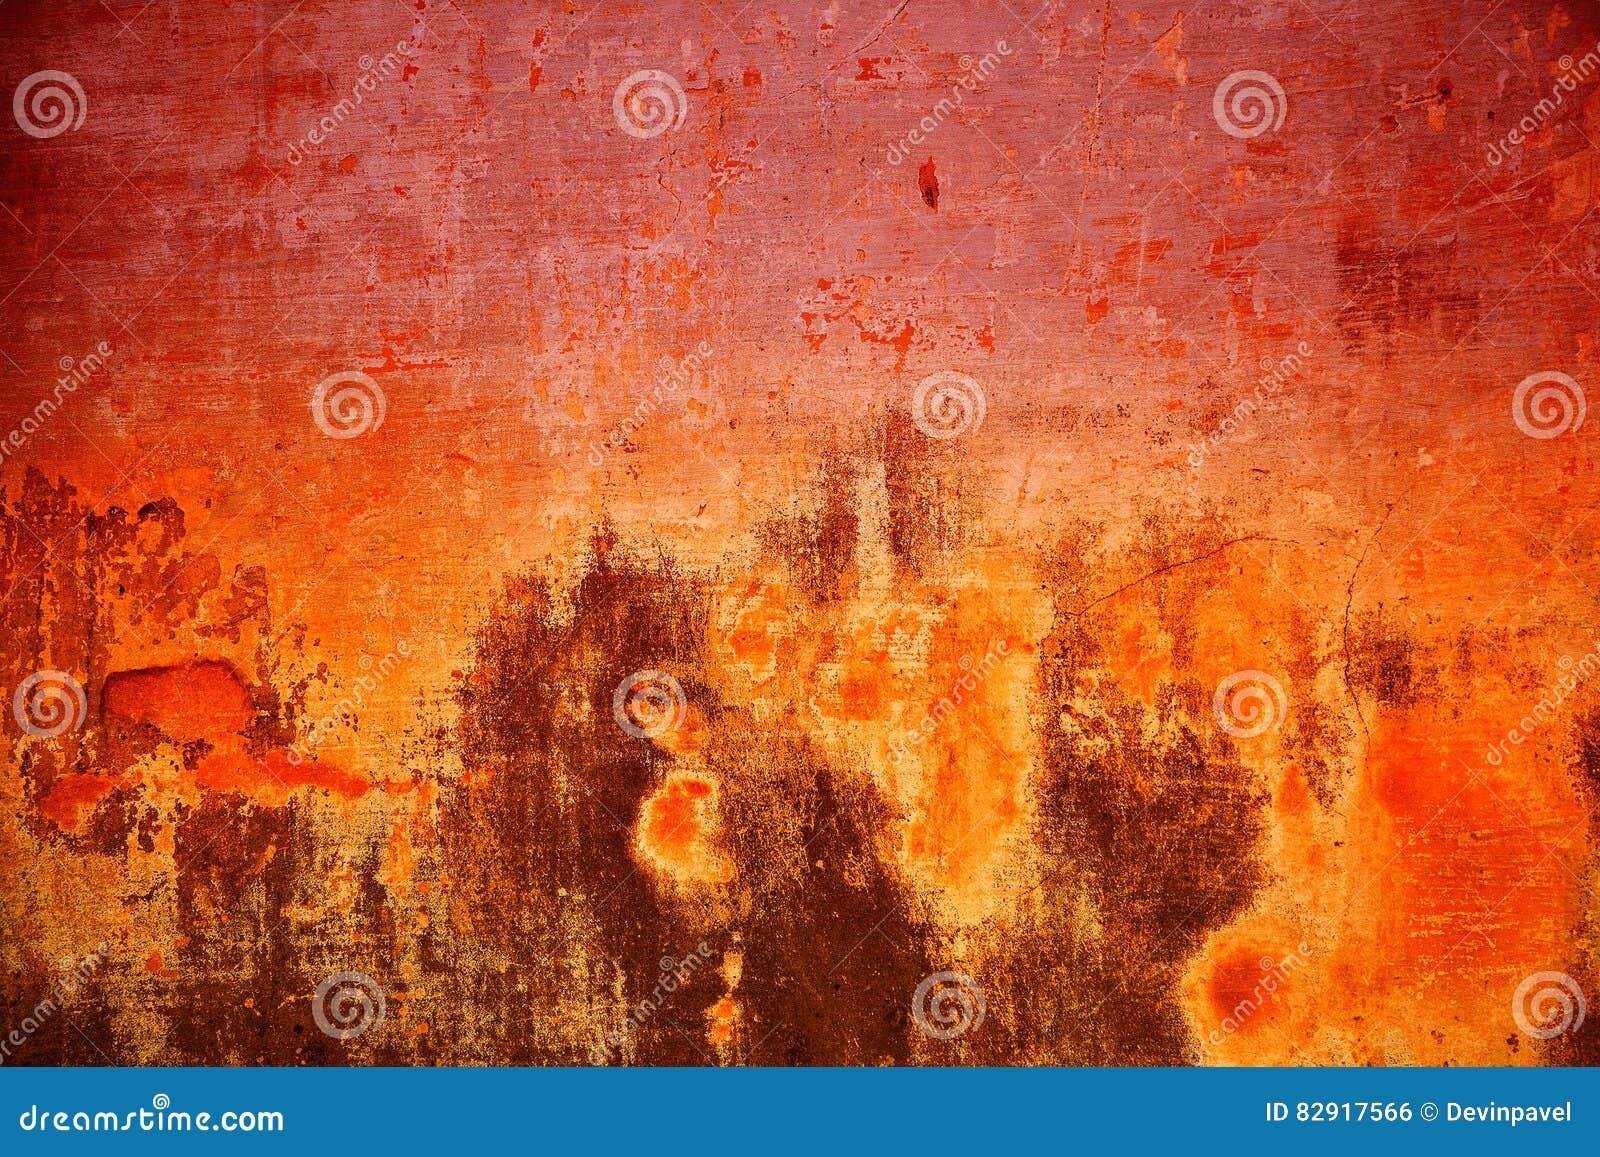 Bunte Hintergrundbeschaffenheits-Zementwand Abstrakte Beschaffenheit ähnlich Feuer